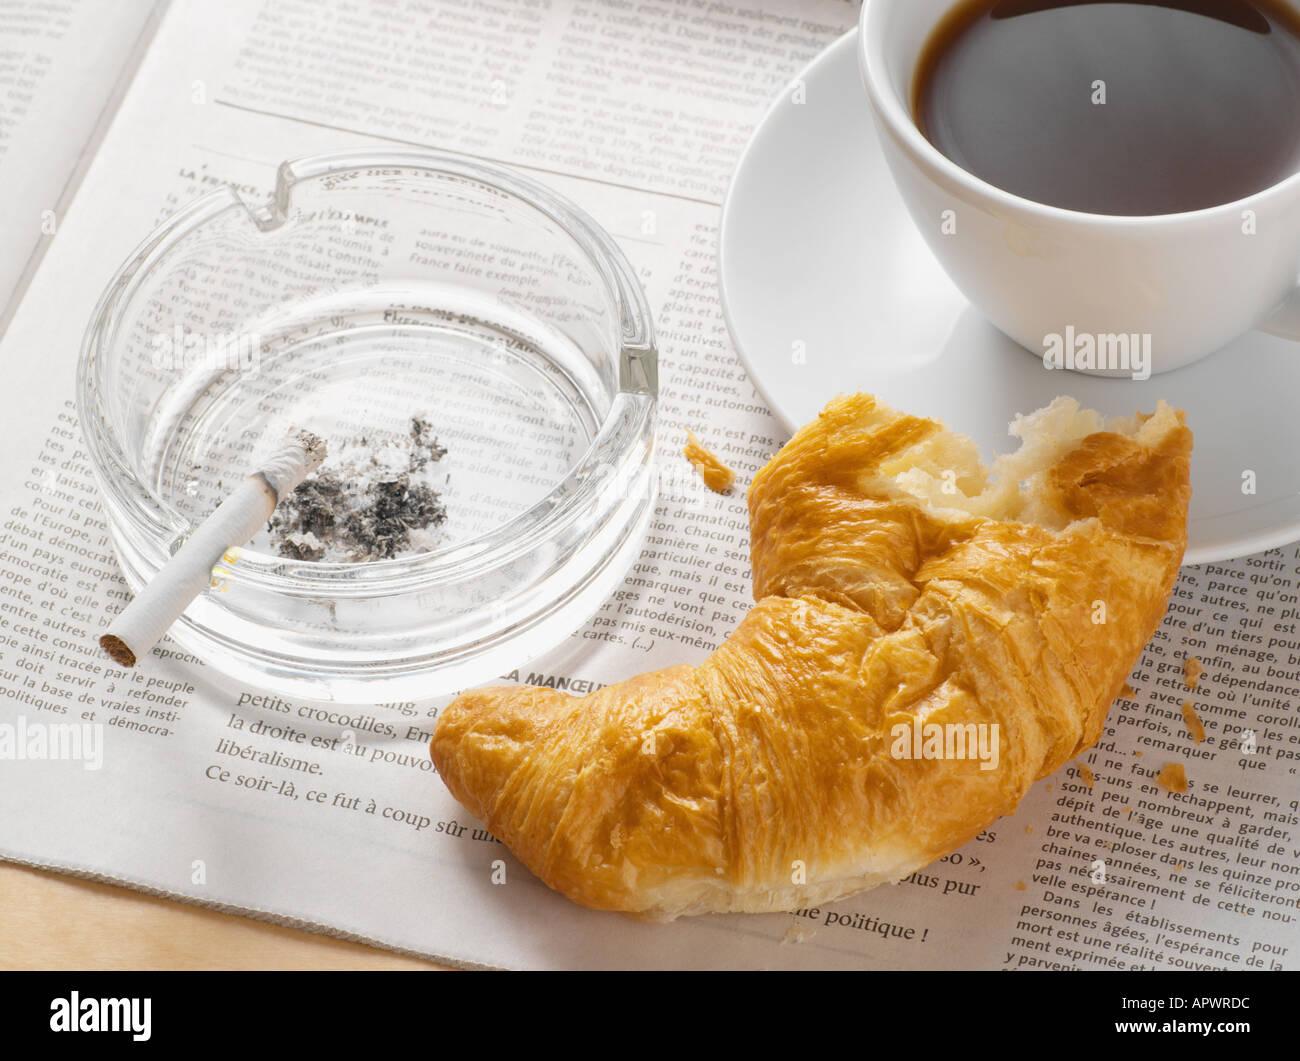 Breakfast items - Stock Image